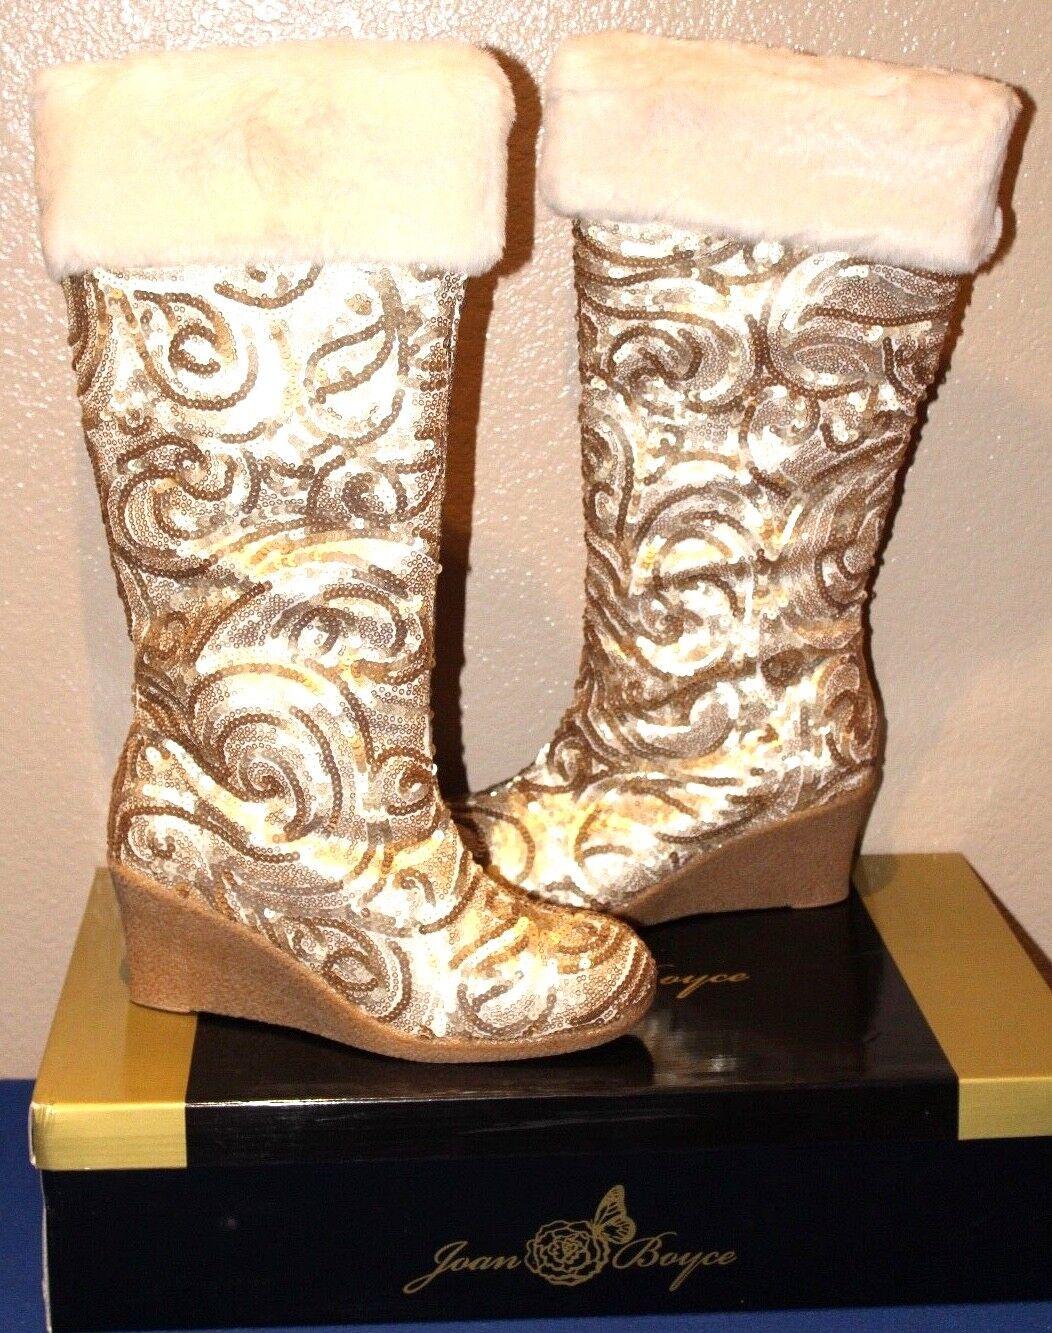 Joan Boyce Shari GOLD SEQUIN With Faux Fur Cuff Tall Wedge Heel Boots Size 10W